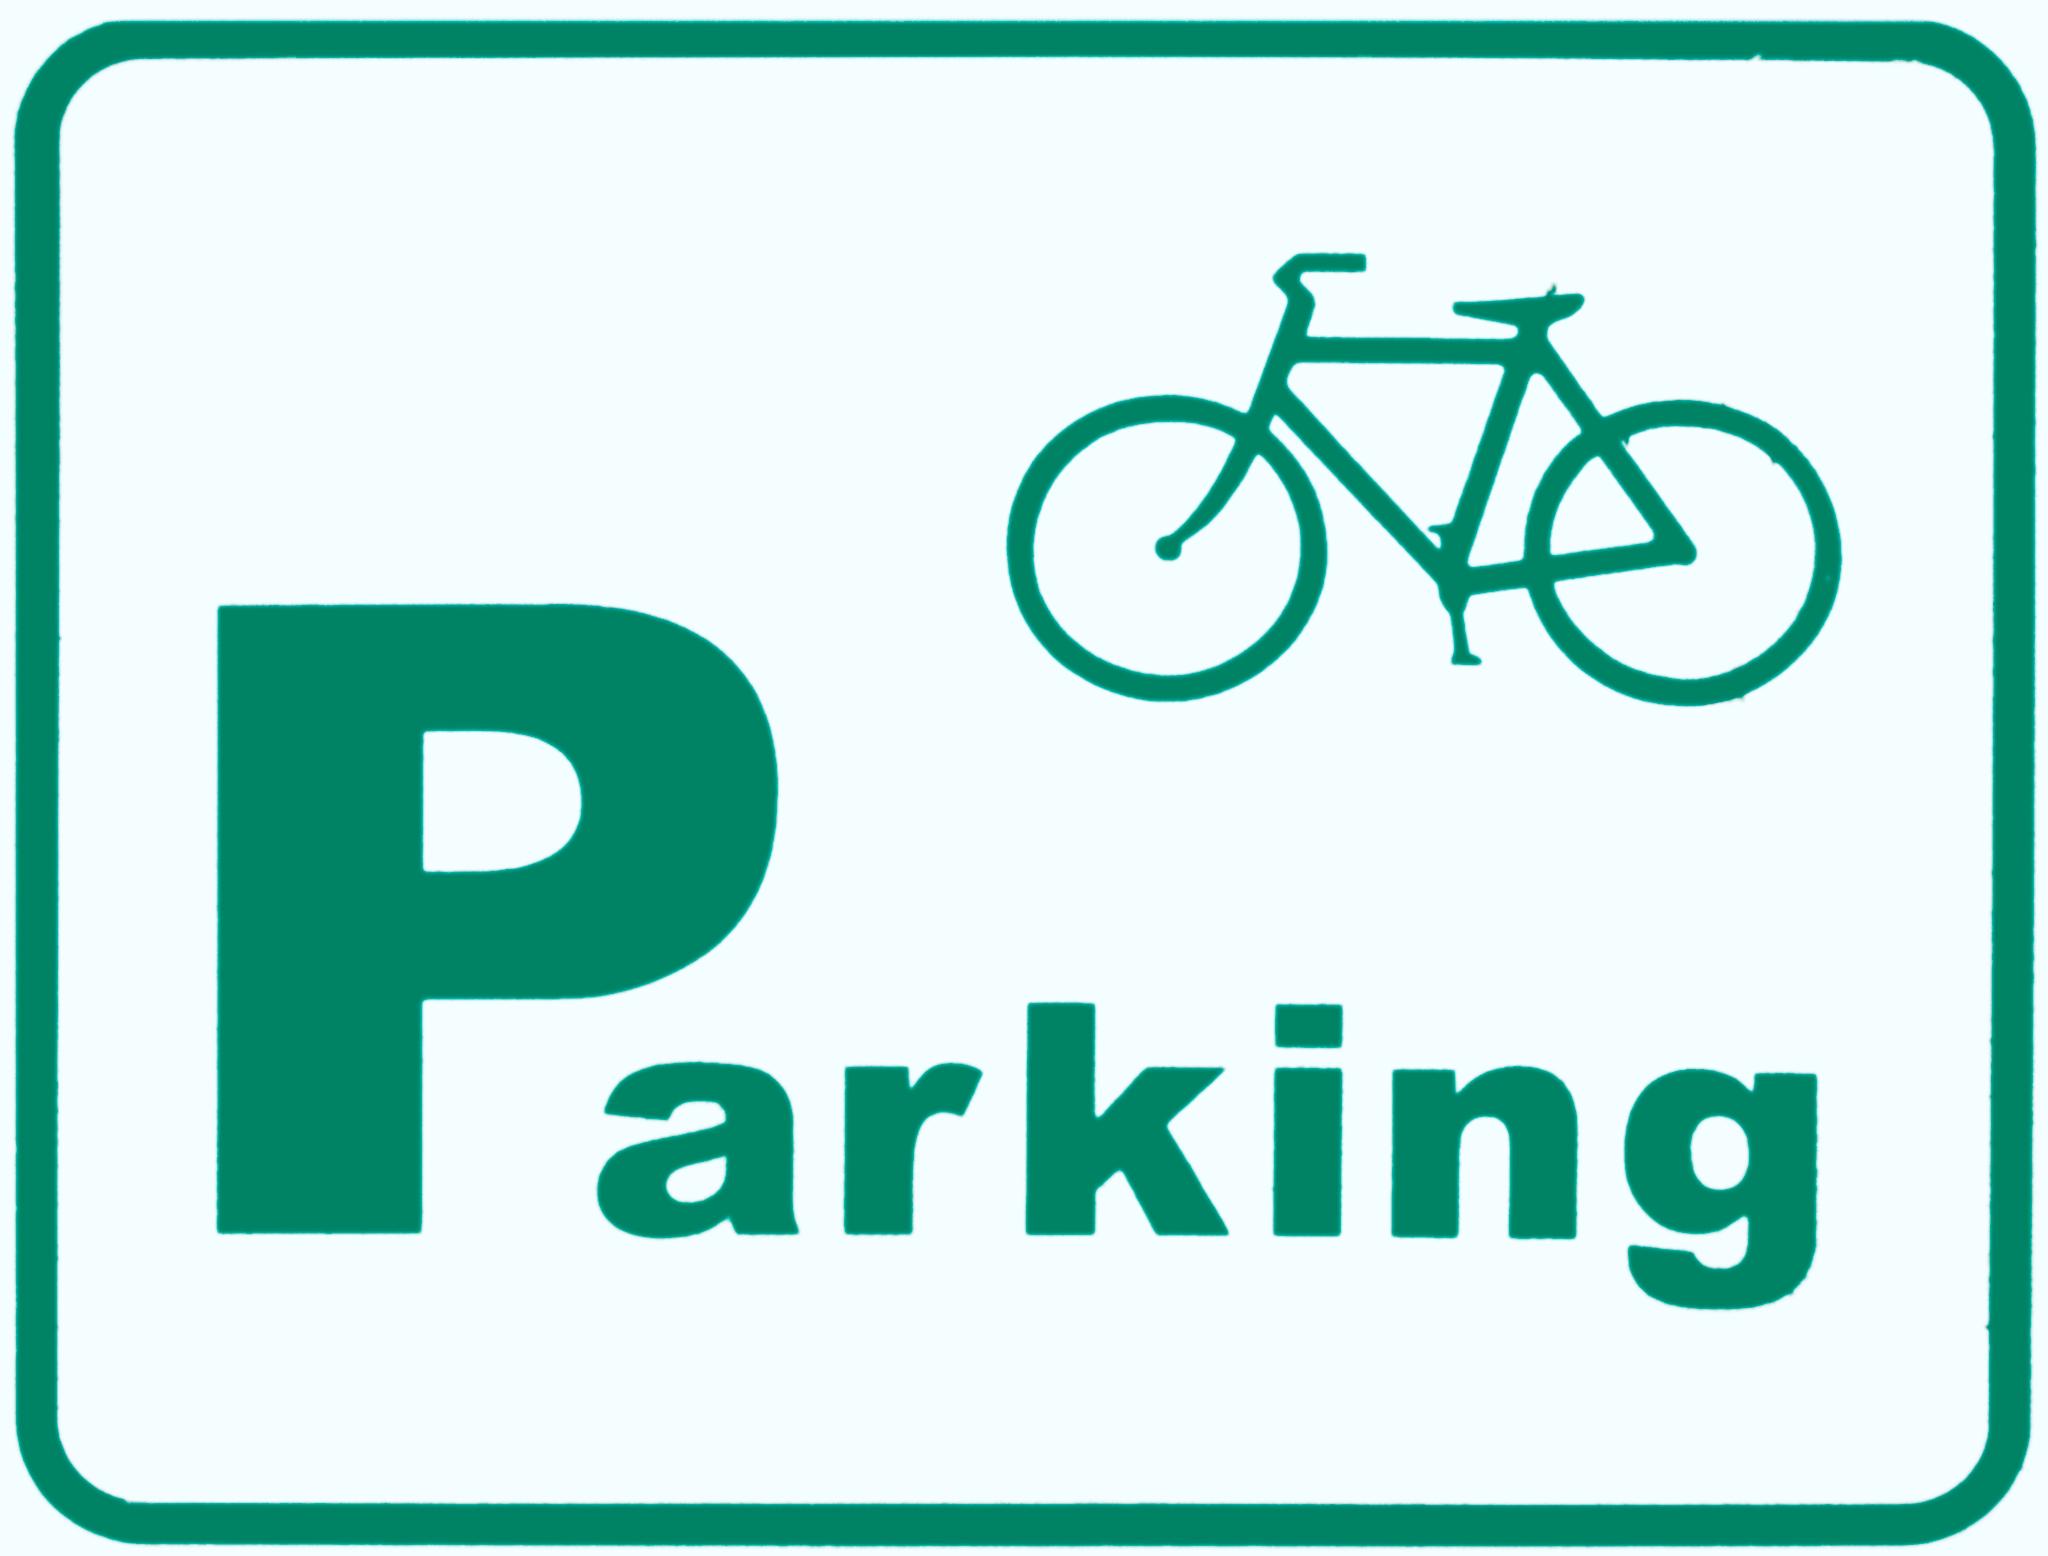 Bike Parking.png